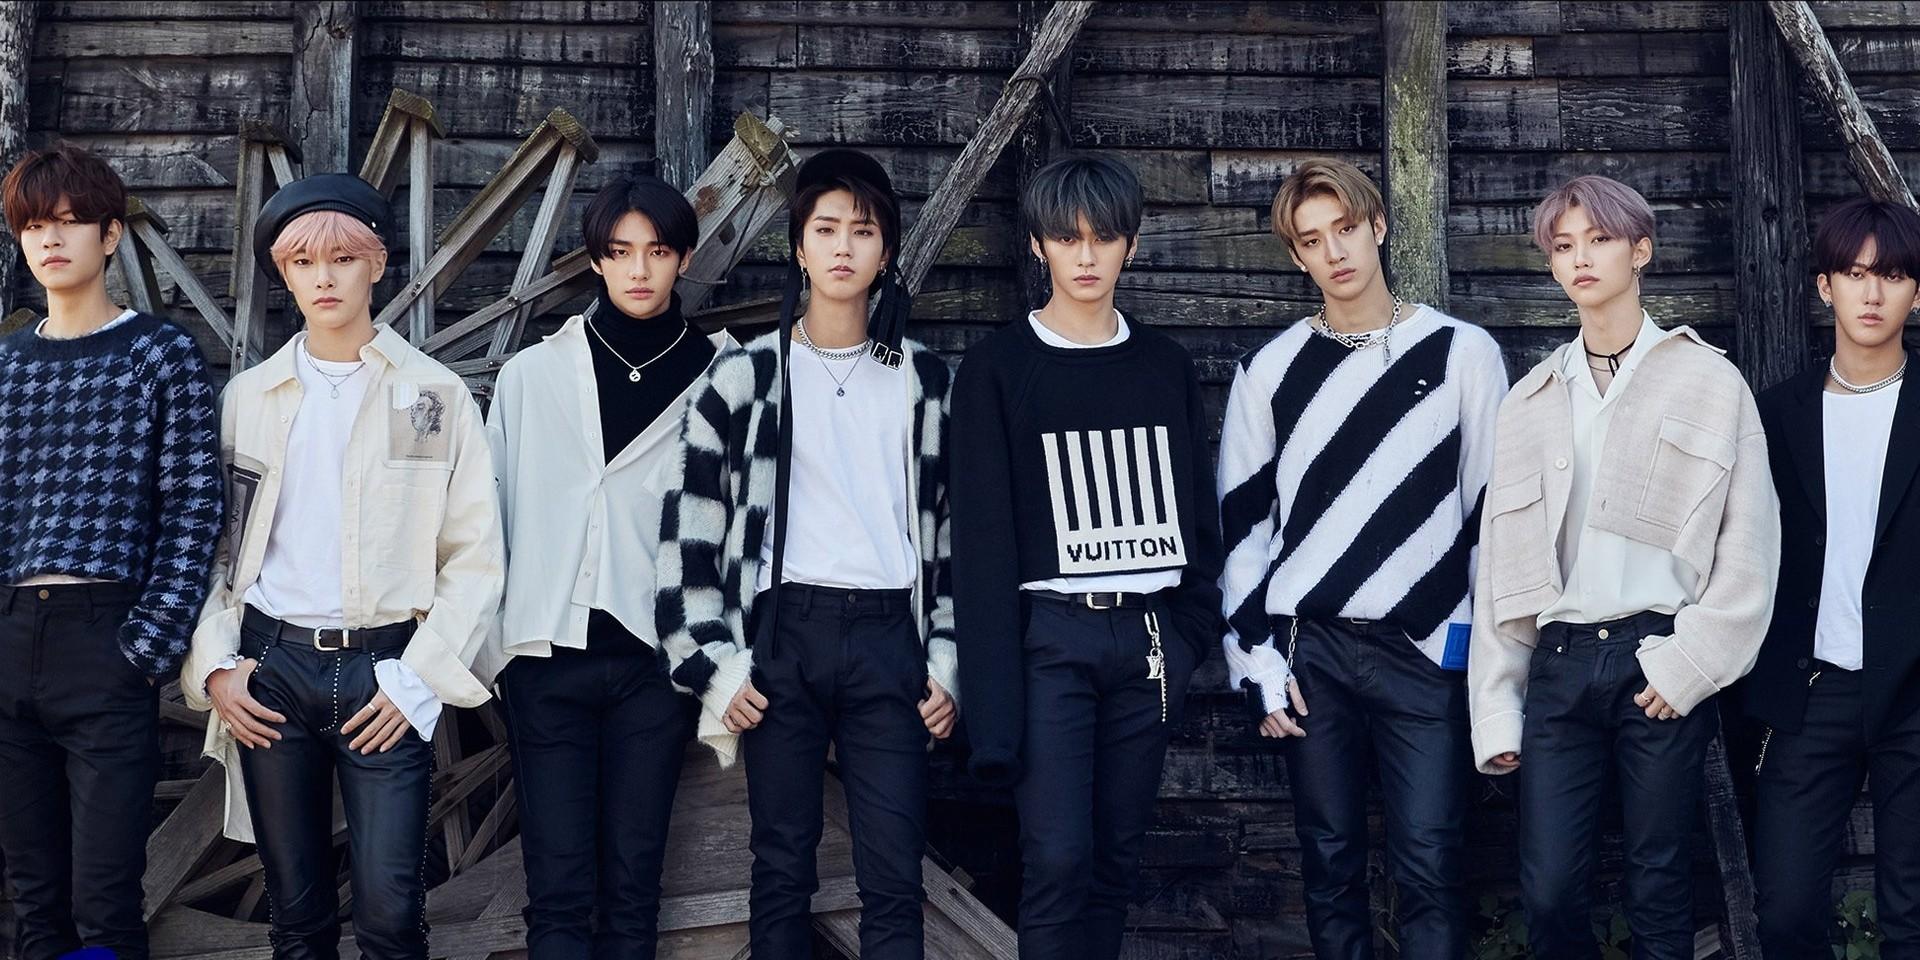 Stray Kids' Manila concert rescheduled to June 2020